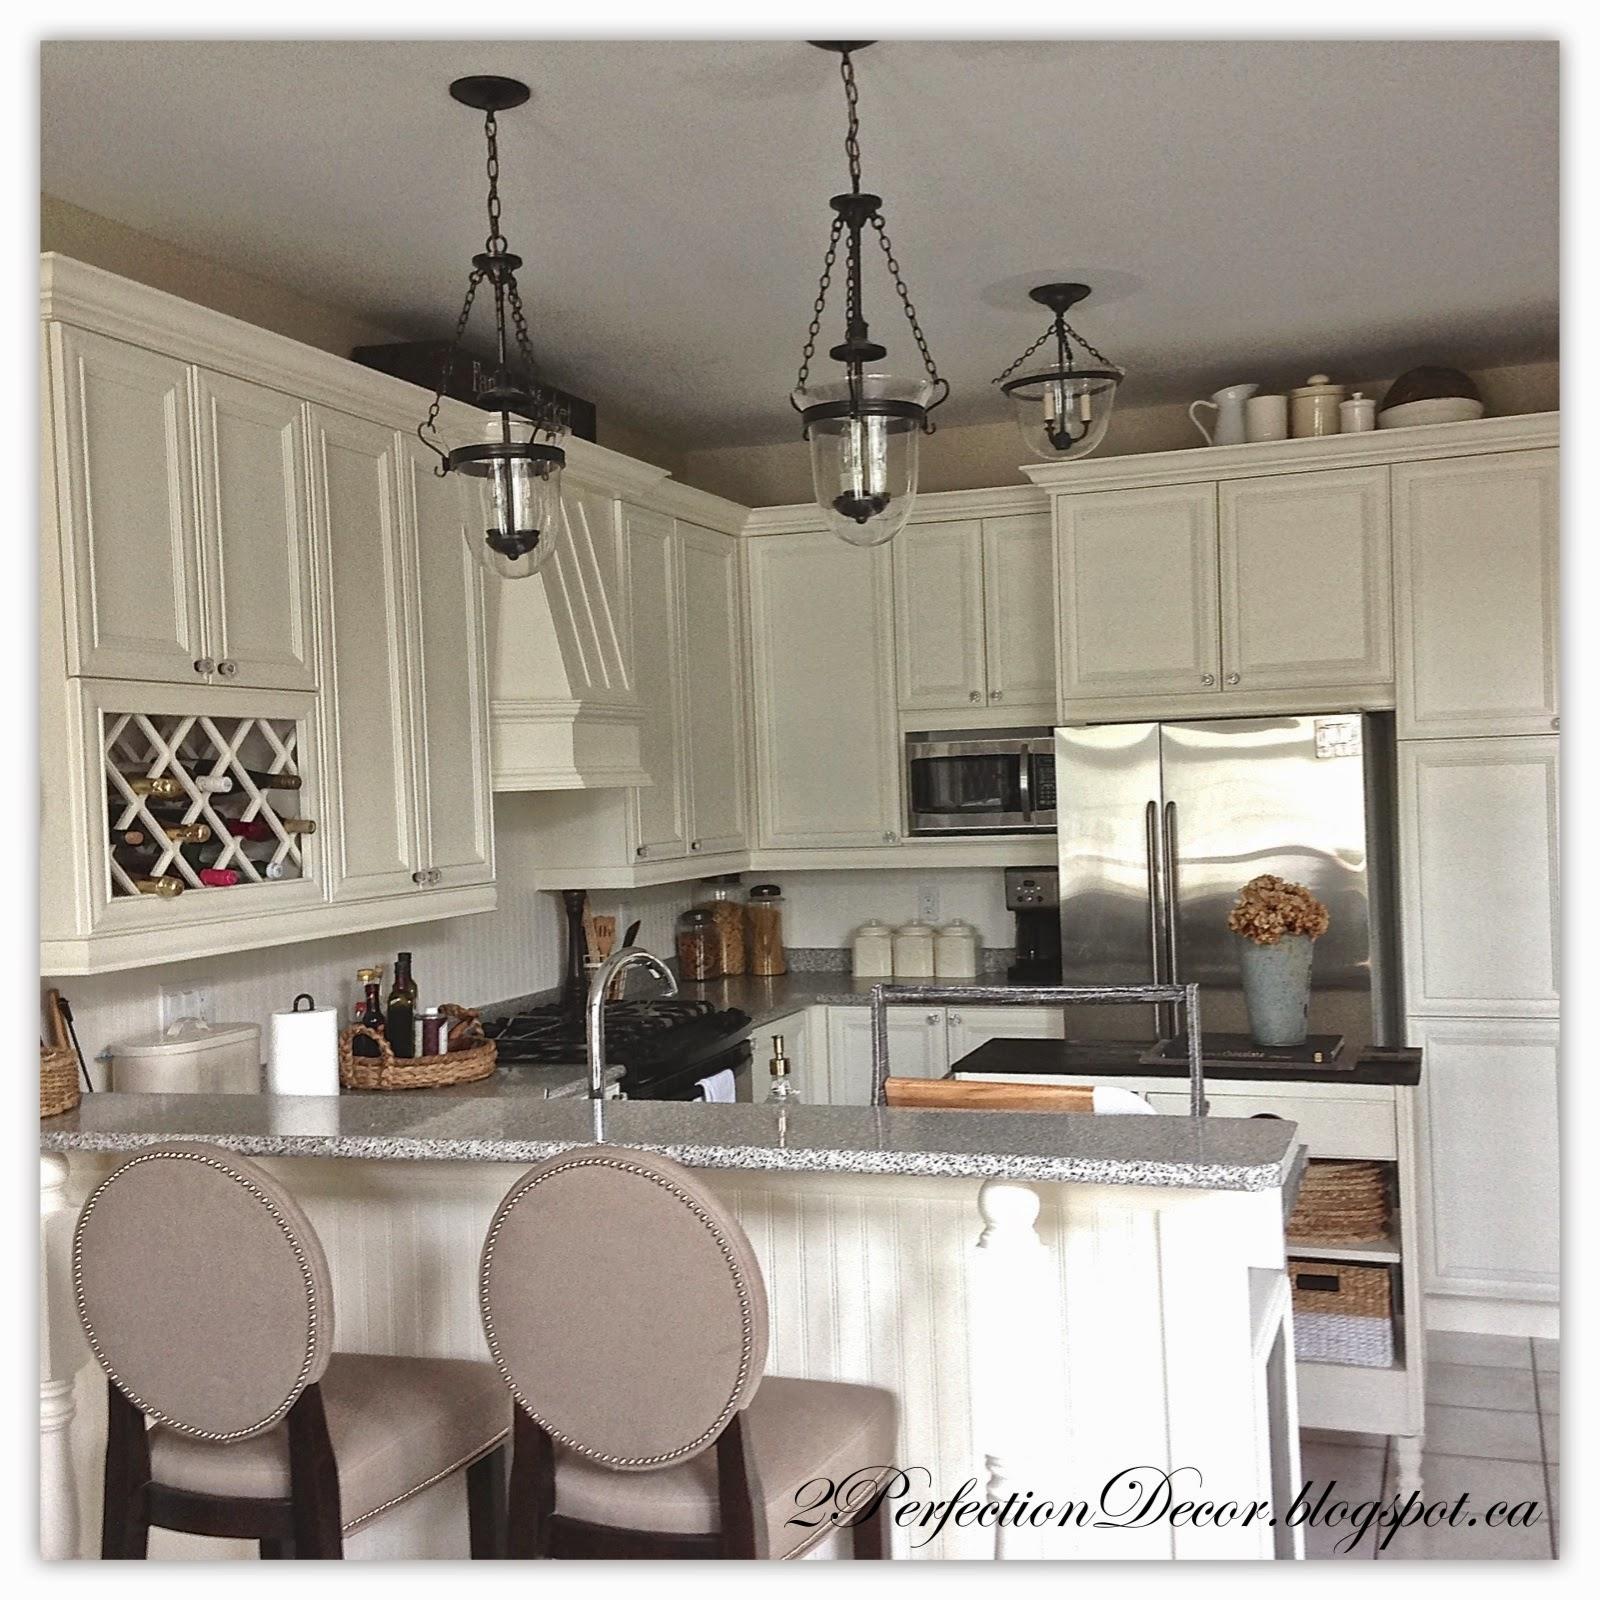 rona kitchen island lighting myideasbedroom com kitchen islands small kitchen islands with sink black